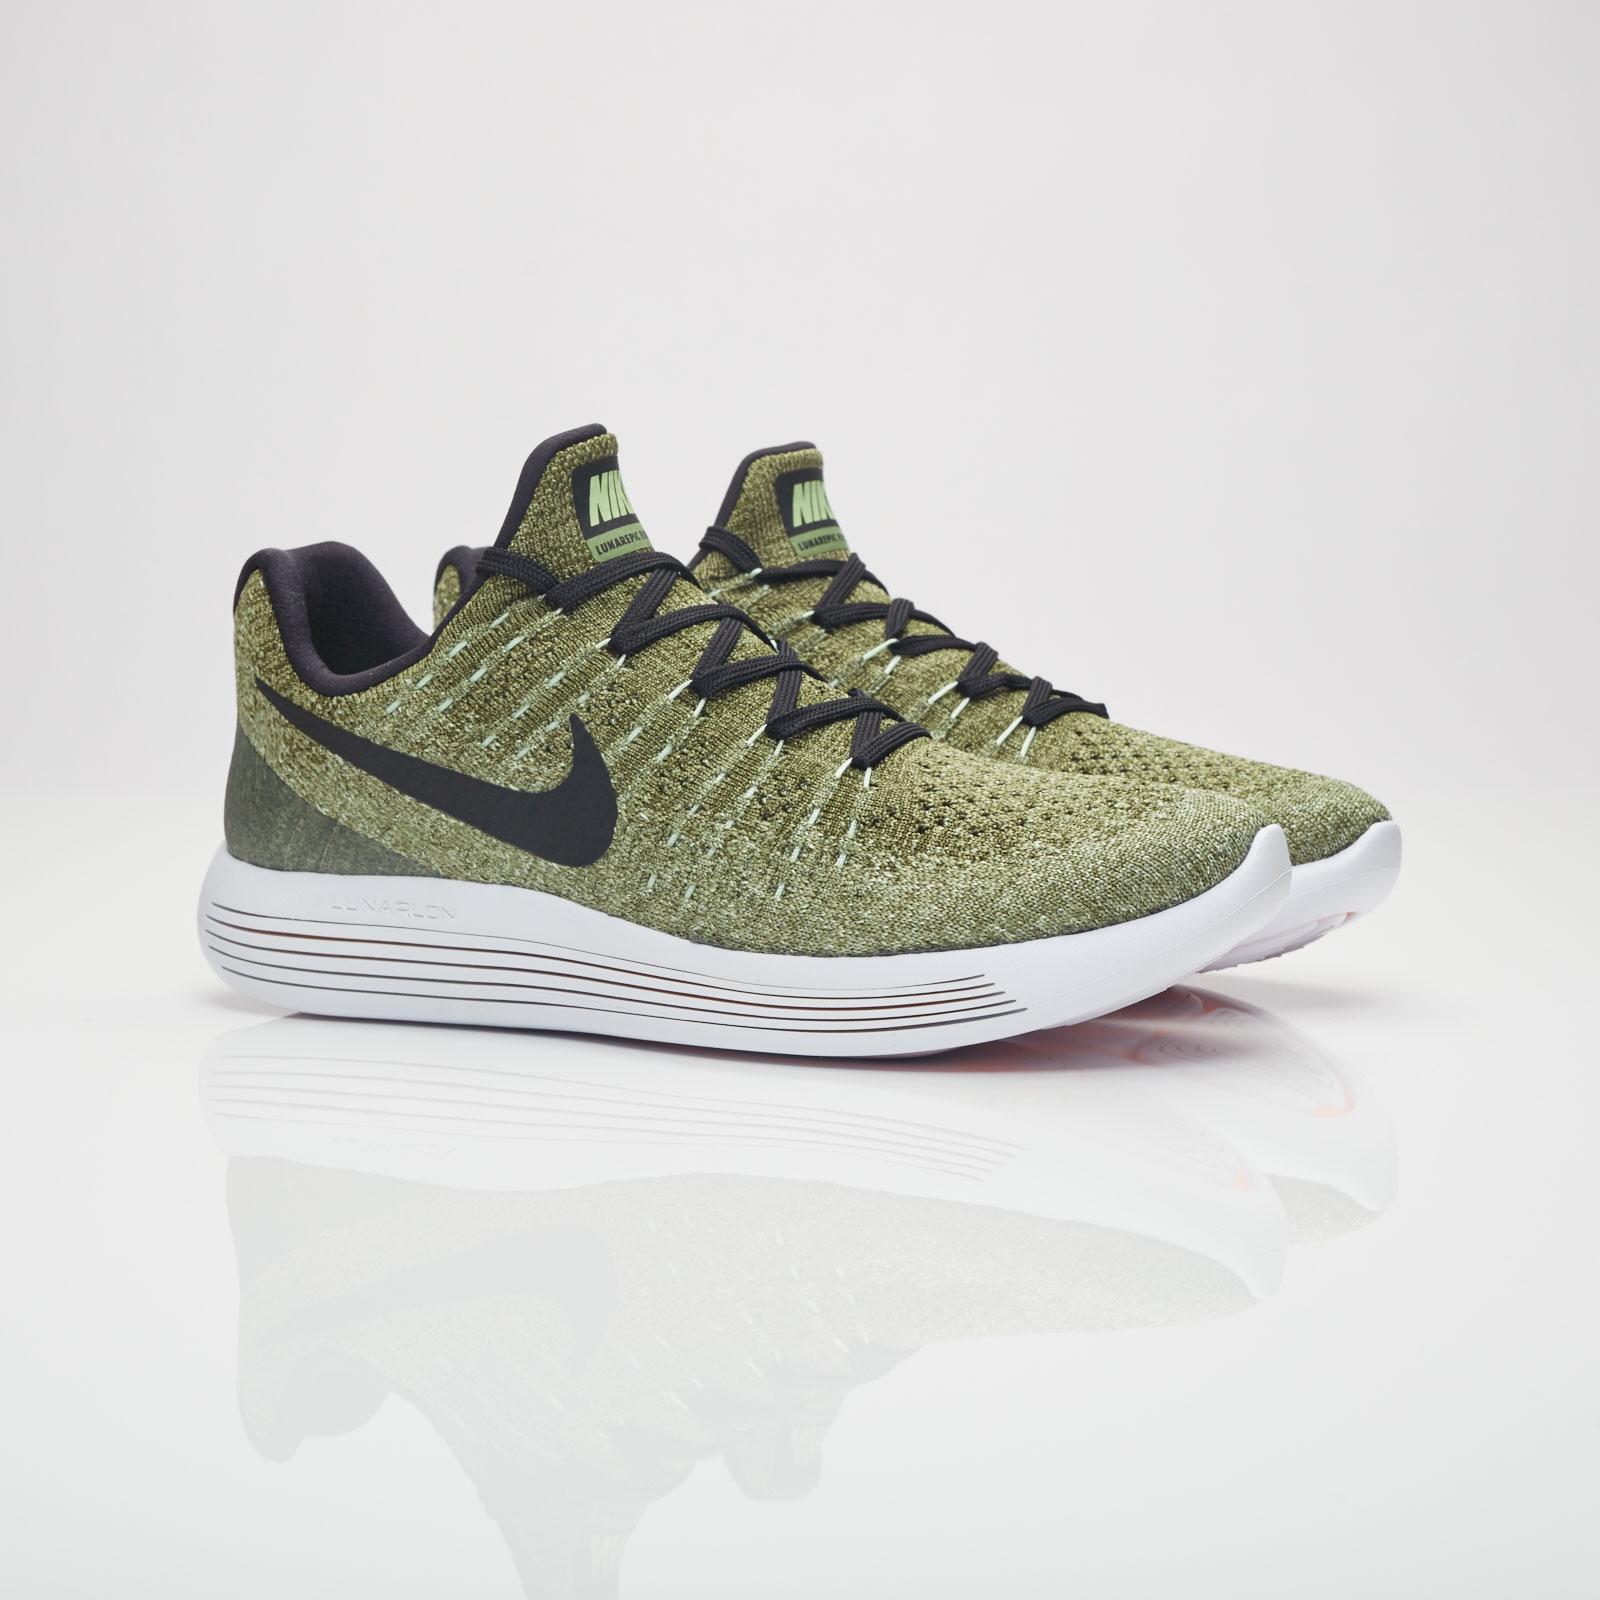 best sneakers 1426a c77f0 Nike Running Wmns Lunarepic Low Flyknit 2